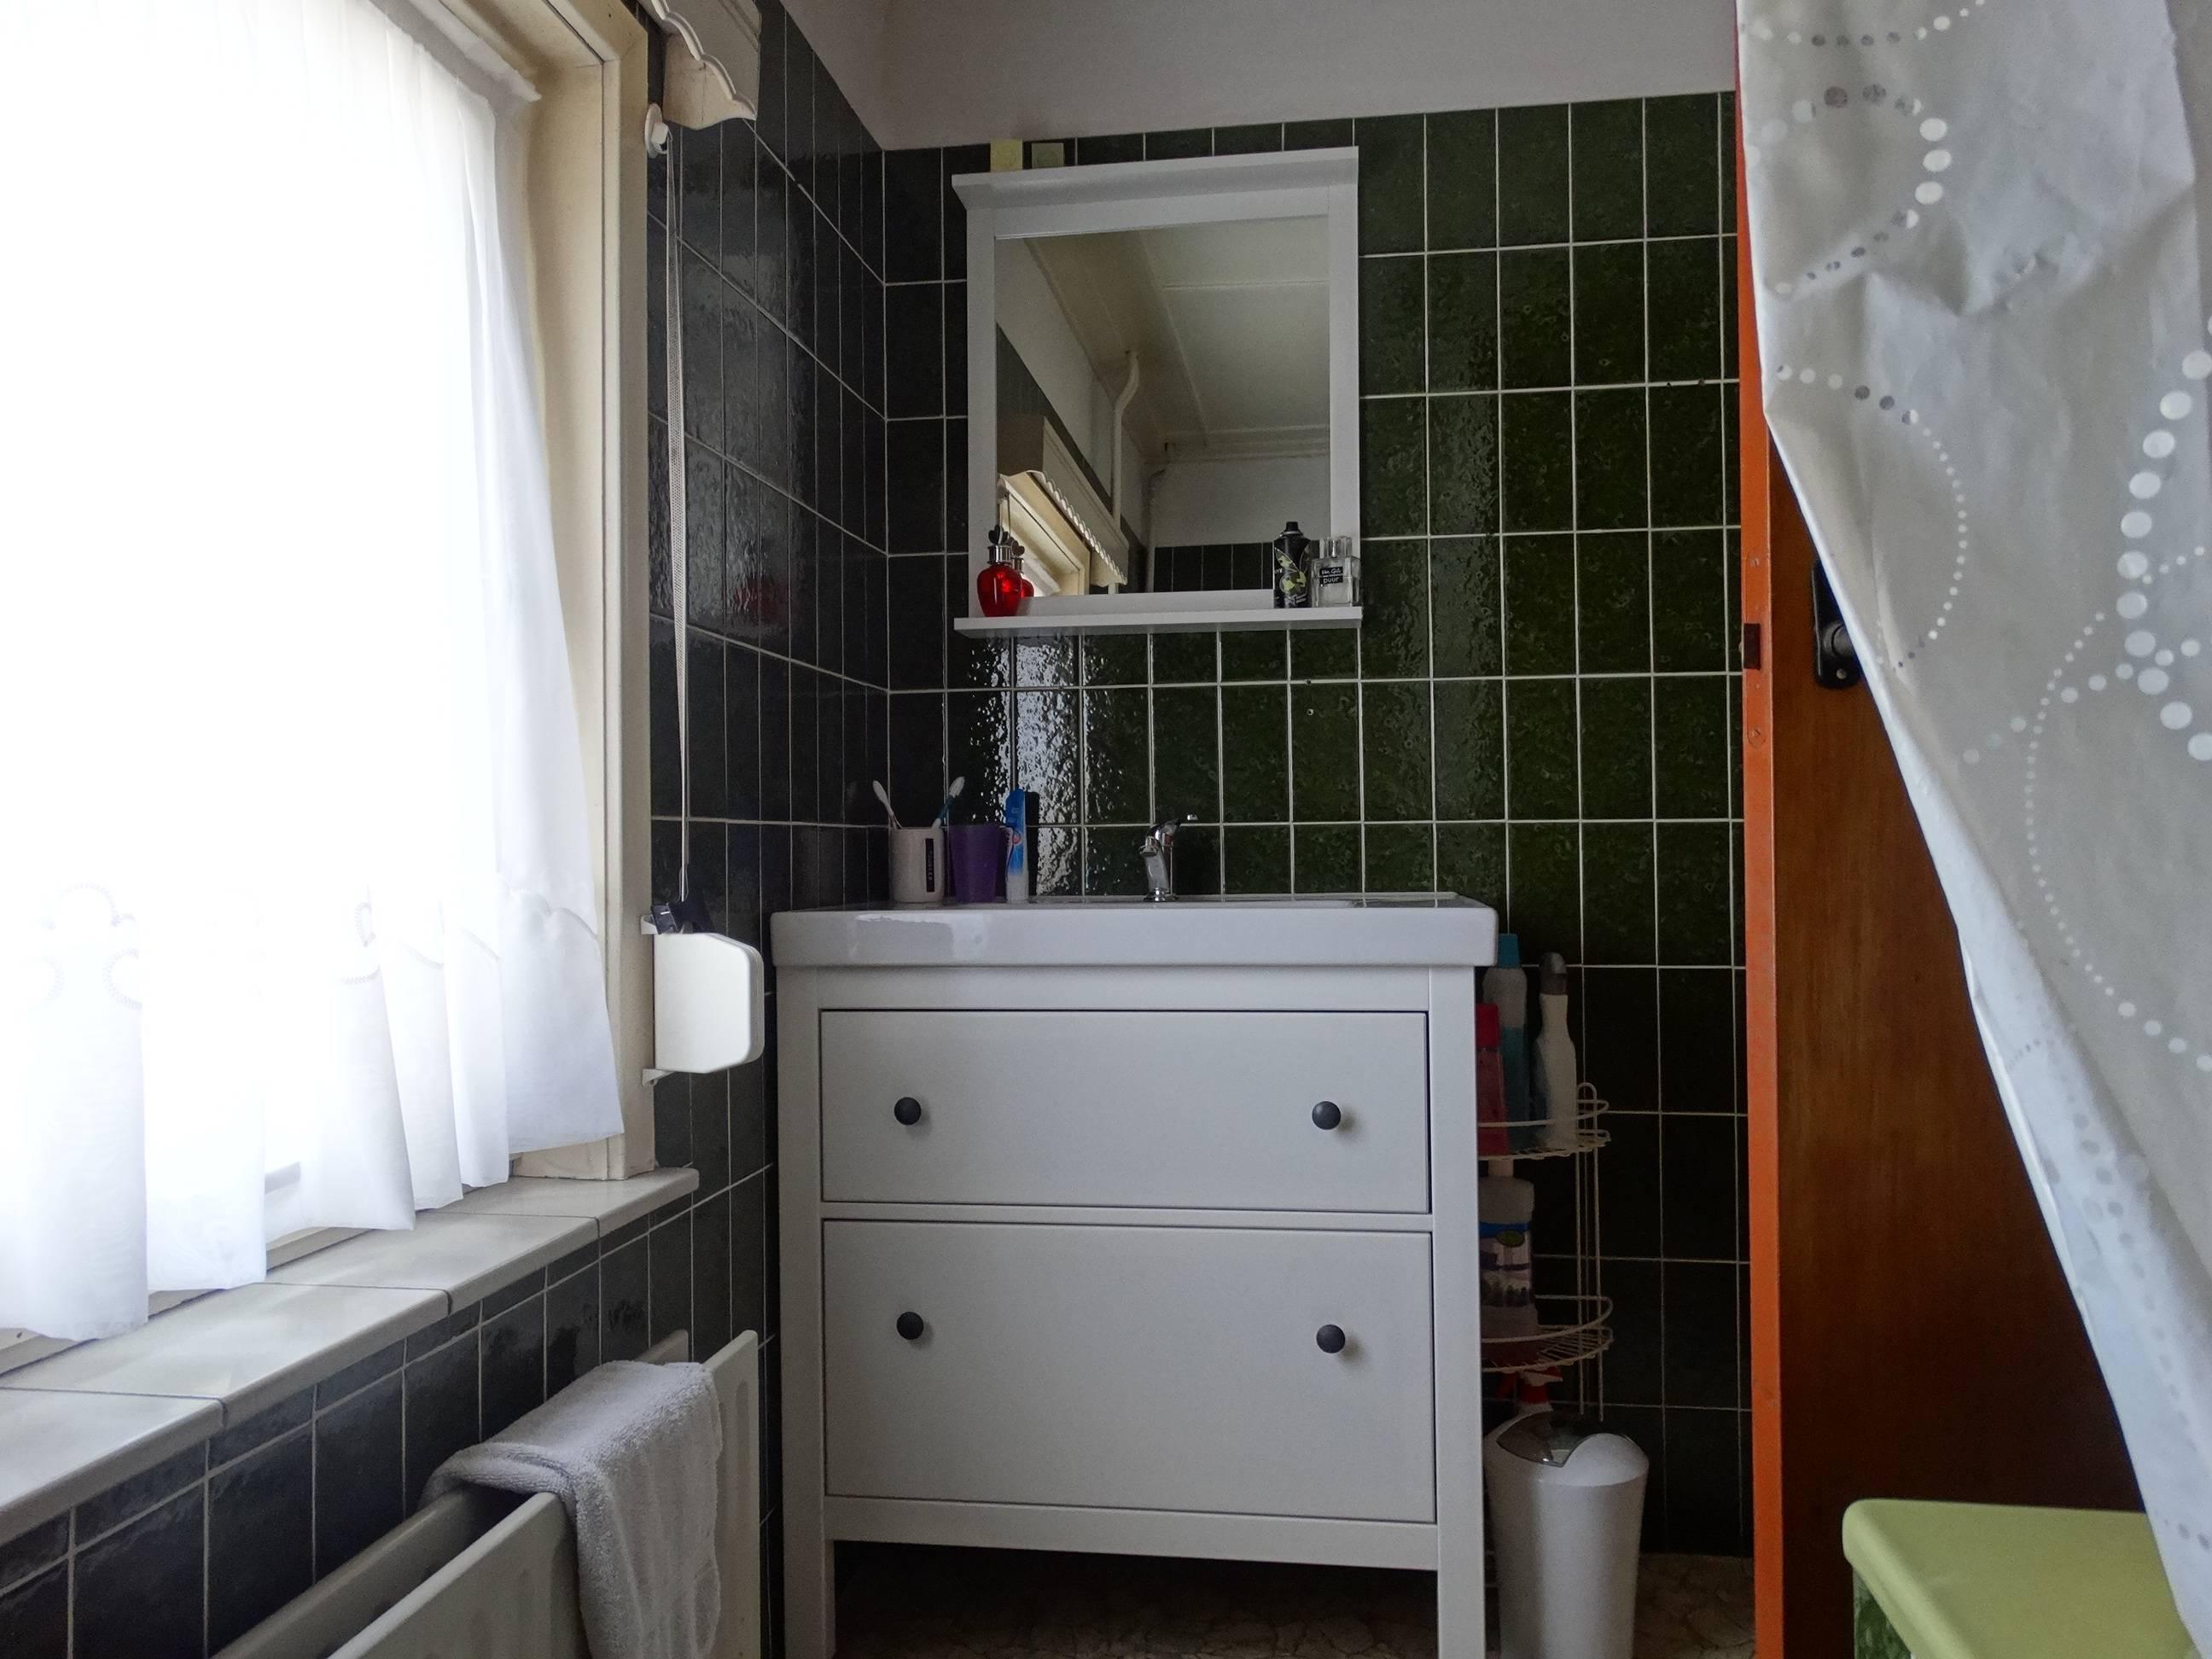 https://public.parariusoffice.nl/170/photos/huge/51695422.1528965561-524.JPG